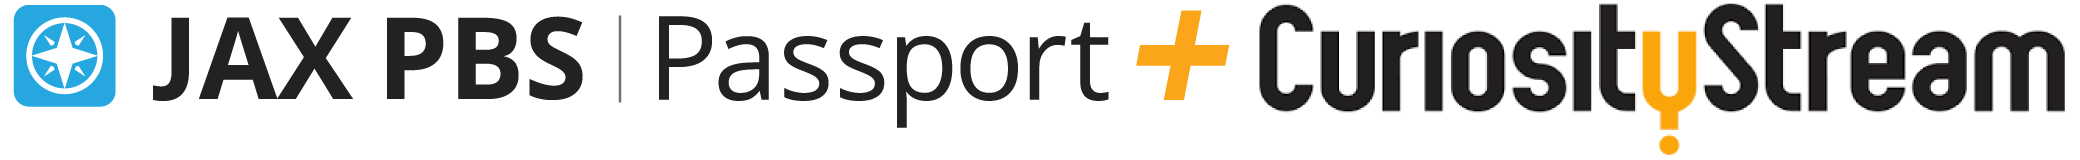 WJCT Passport + CuriosityStream